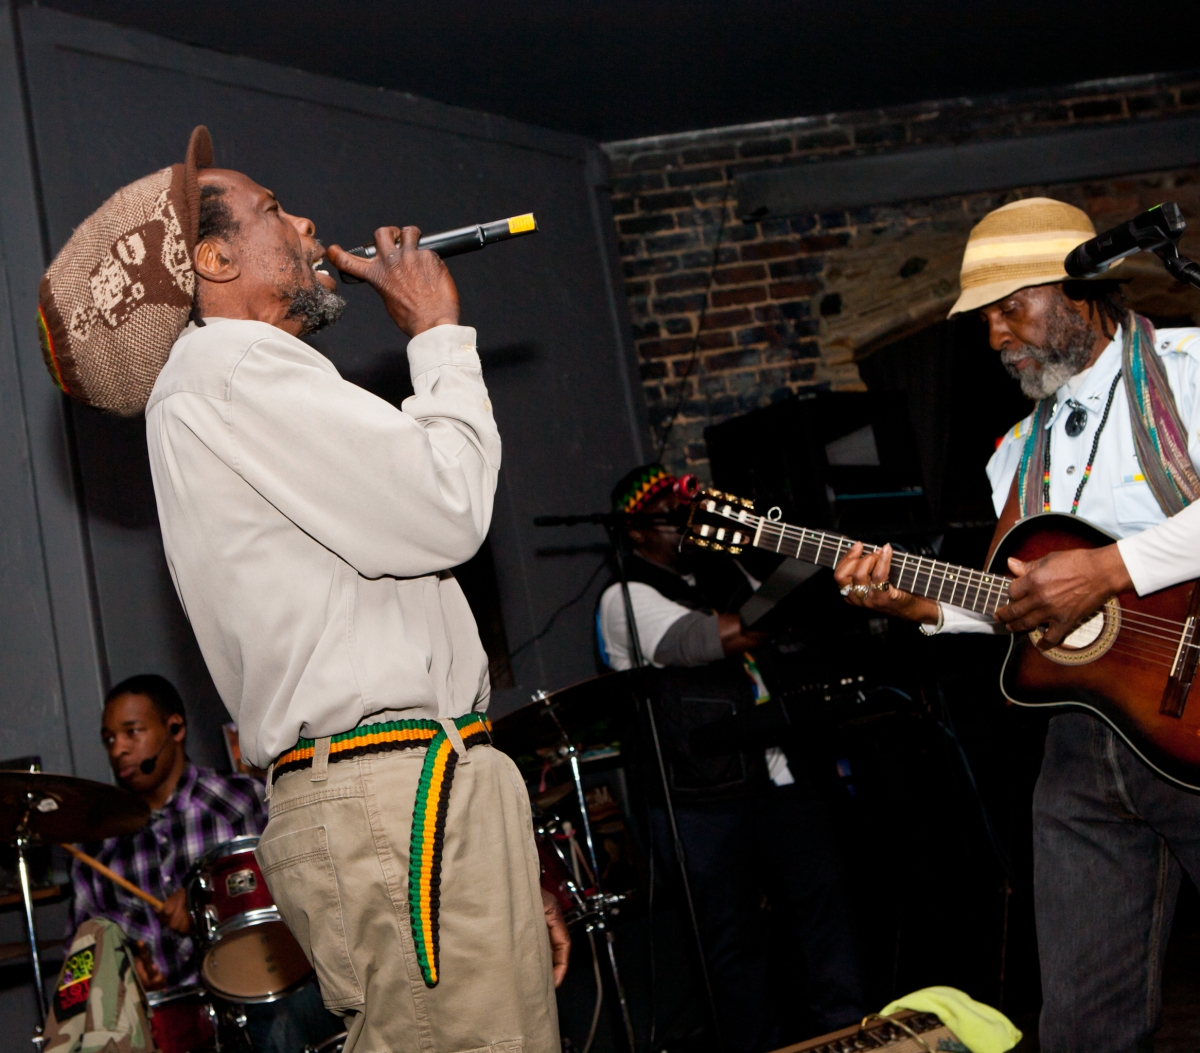 Ijahknowah and his band, B.R.A.P